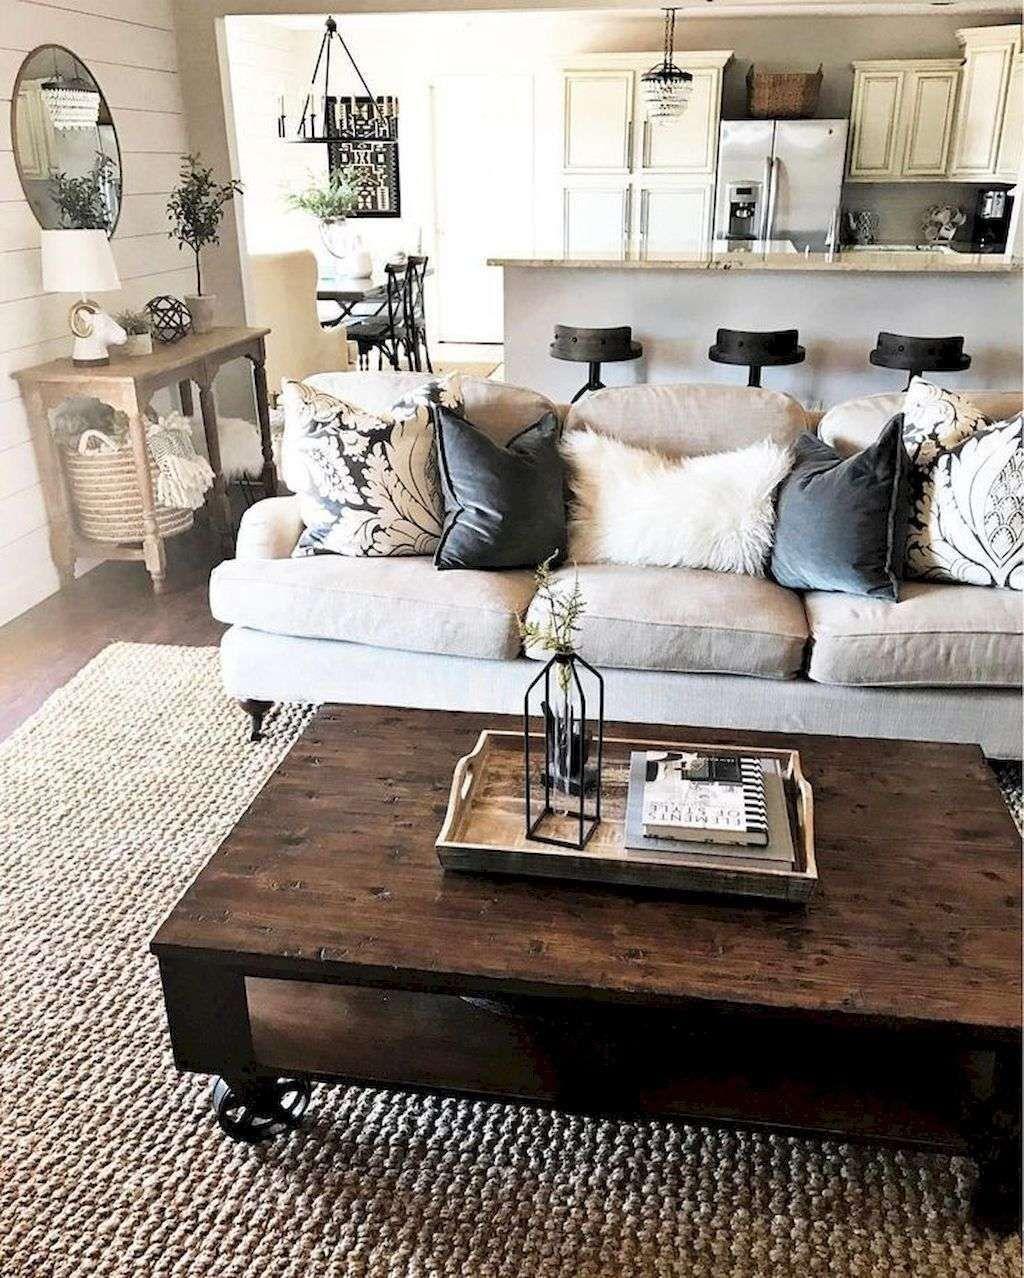 Rustic industrial bench rustic living room beamsrustic texture